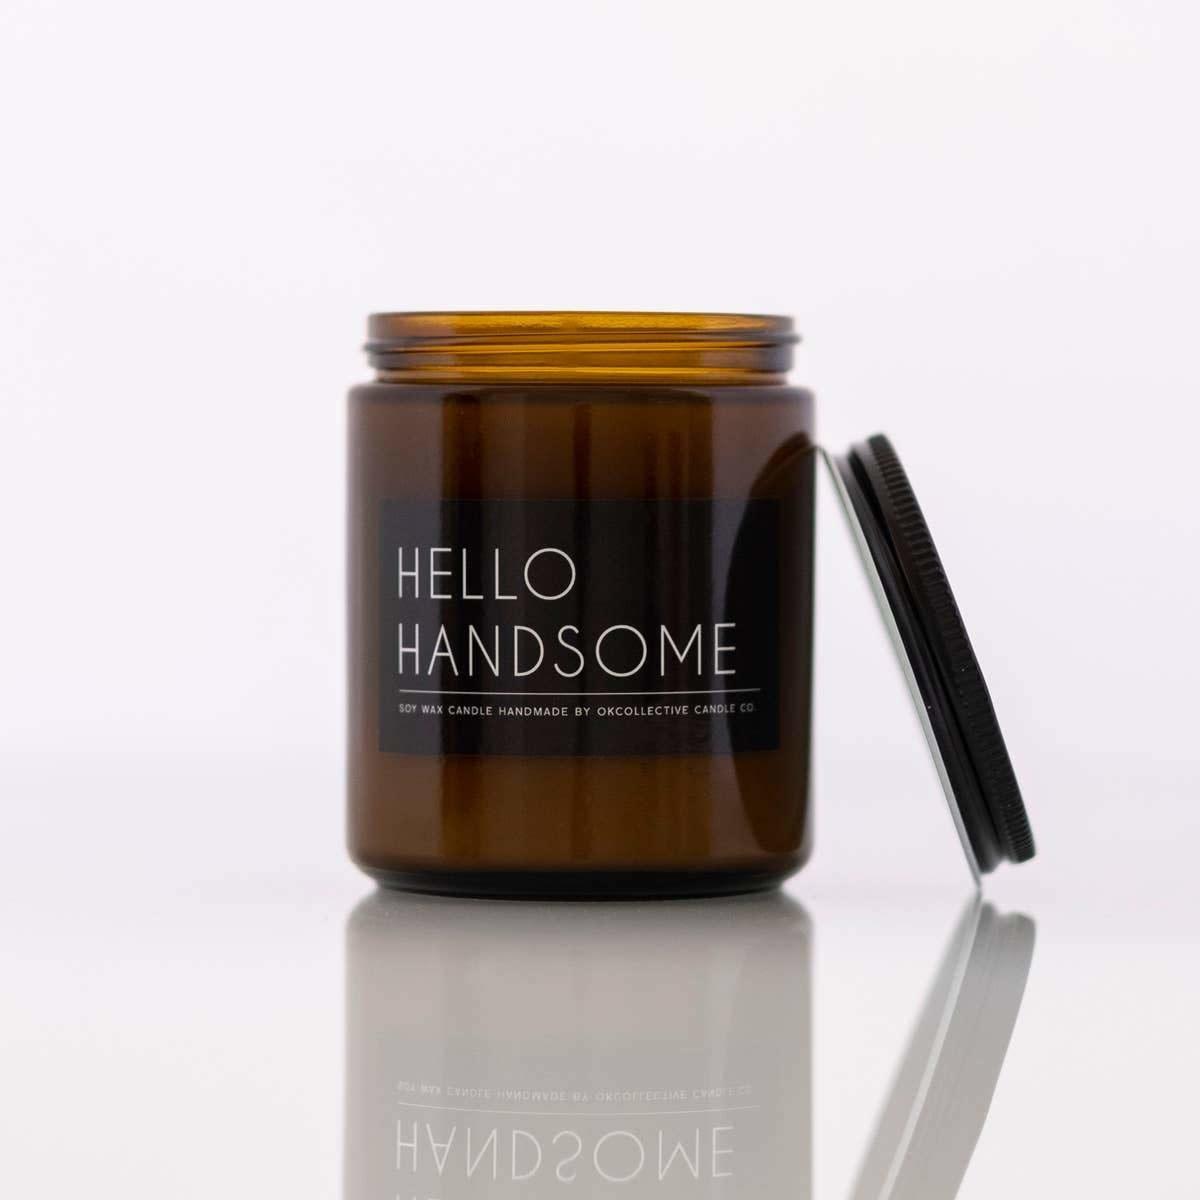 Hello Handsome 8 oz. Candle